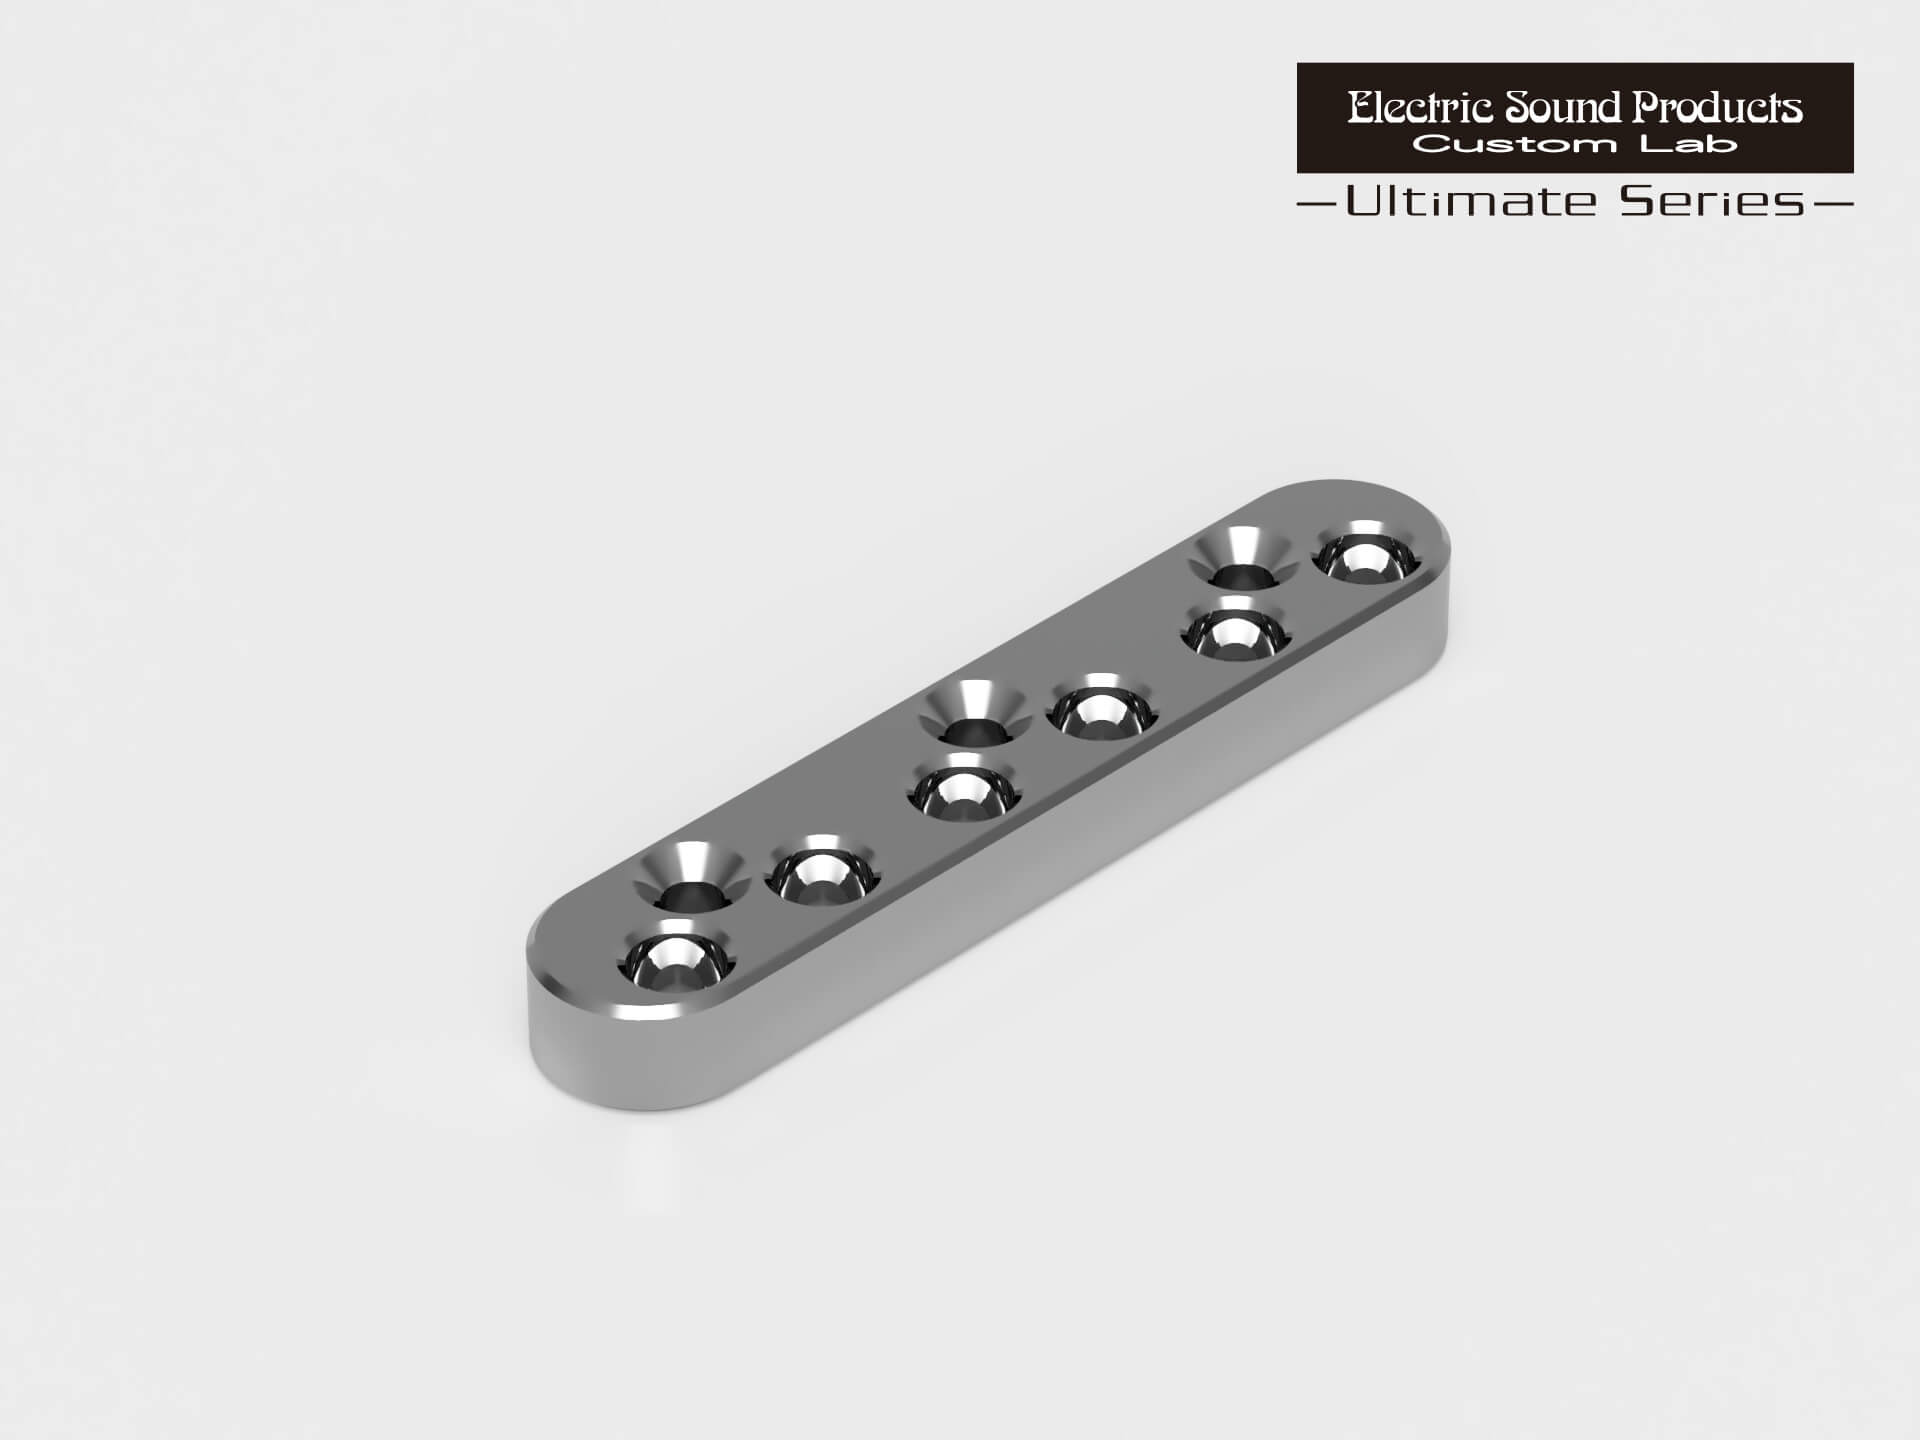 ESP Parts Custom Lab String Back Plate メーカー在庫限り品 6弦用 パーツ カスタムラボ アルティメイトシリーズ Chrome 即出荷 クローム 6